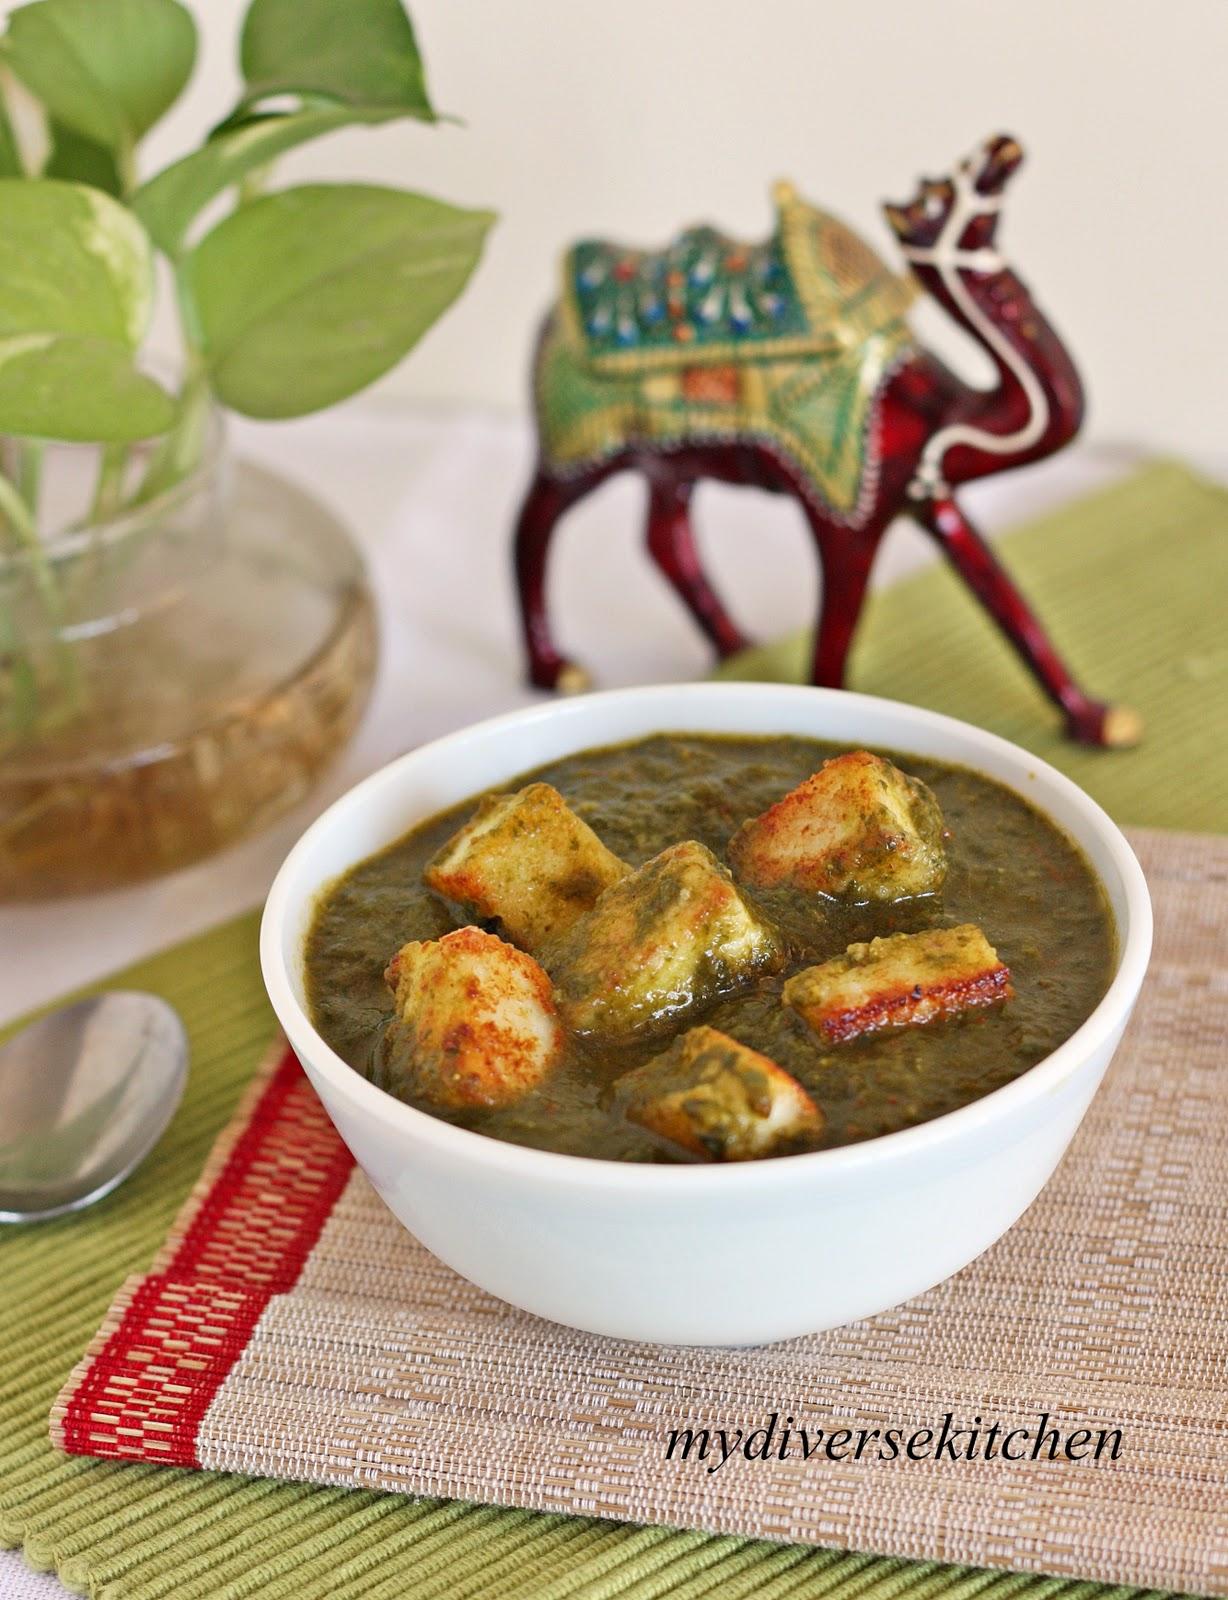 ... Diverse Kitchen: Palak Paneer (Indian Cheese In A Mild Spinach Gravy